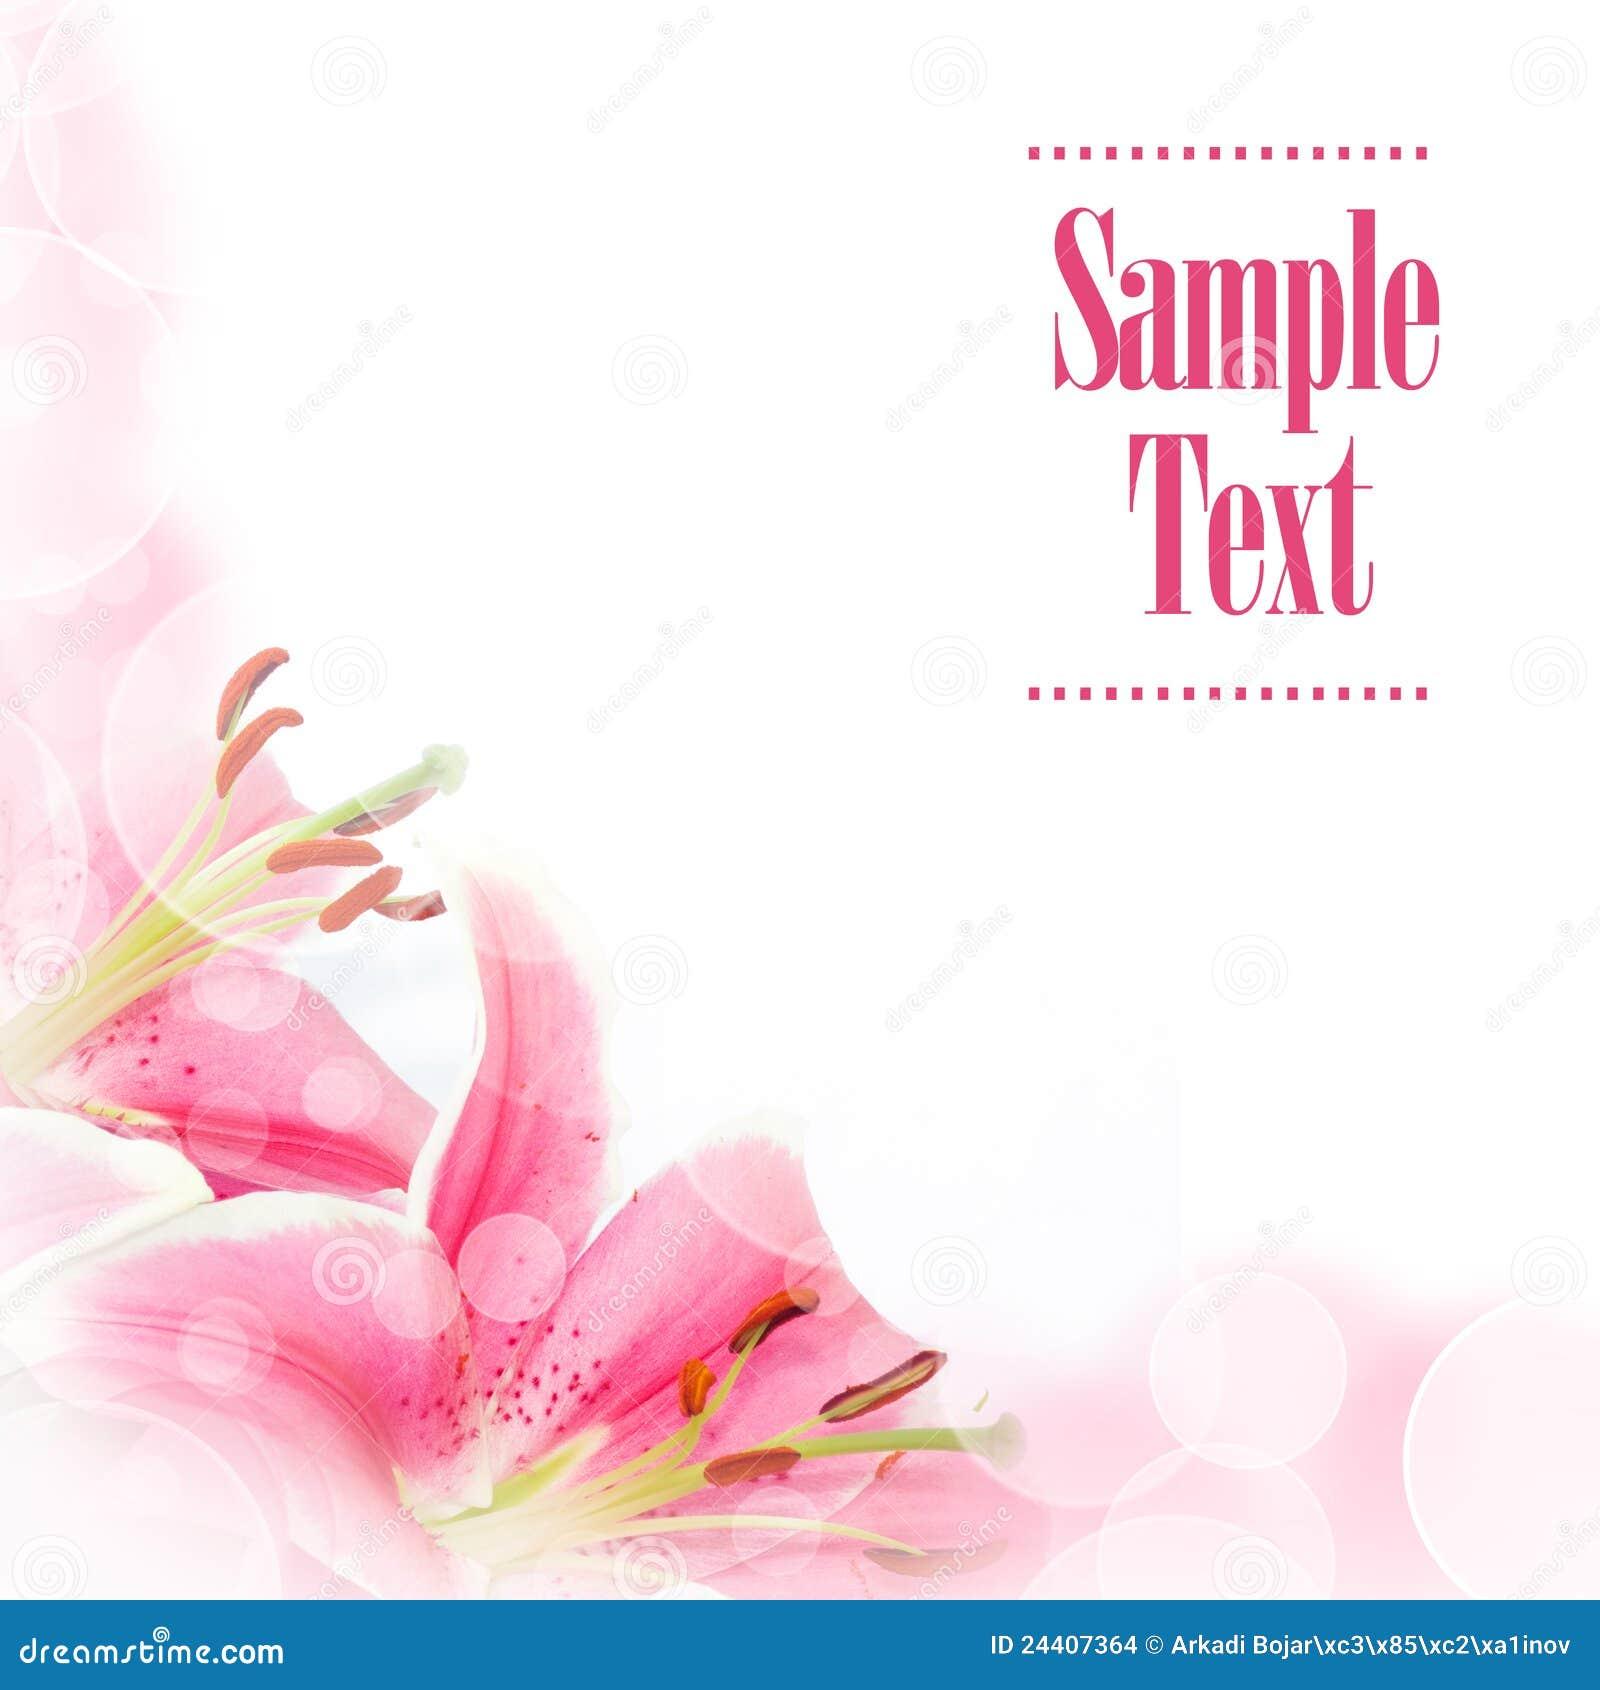 Flower Greeting Card Stock Photo. Image Of Border, Bokeh